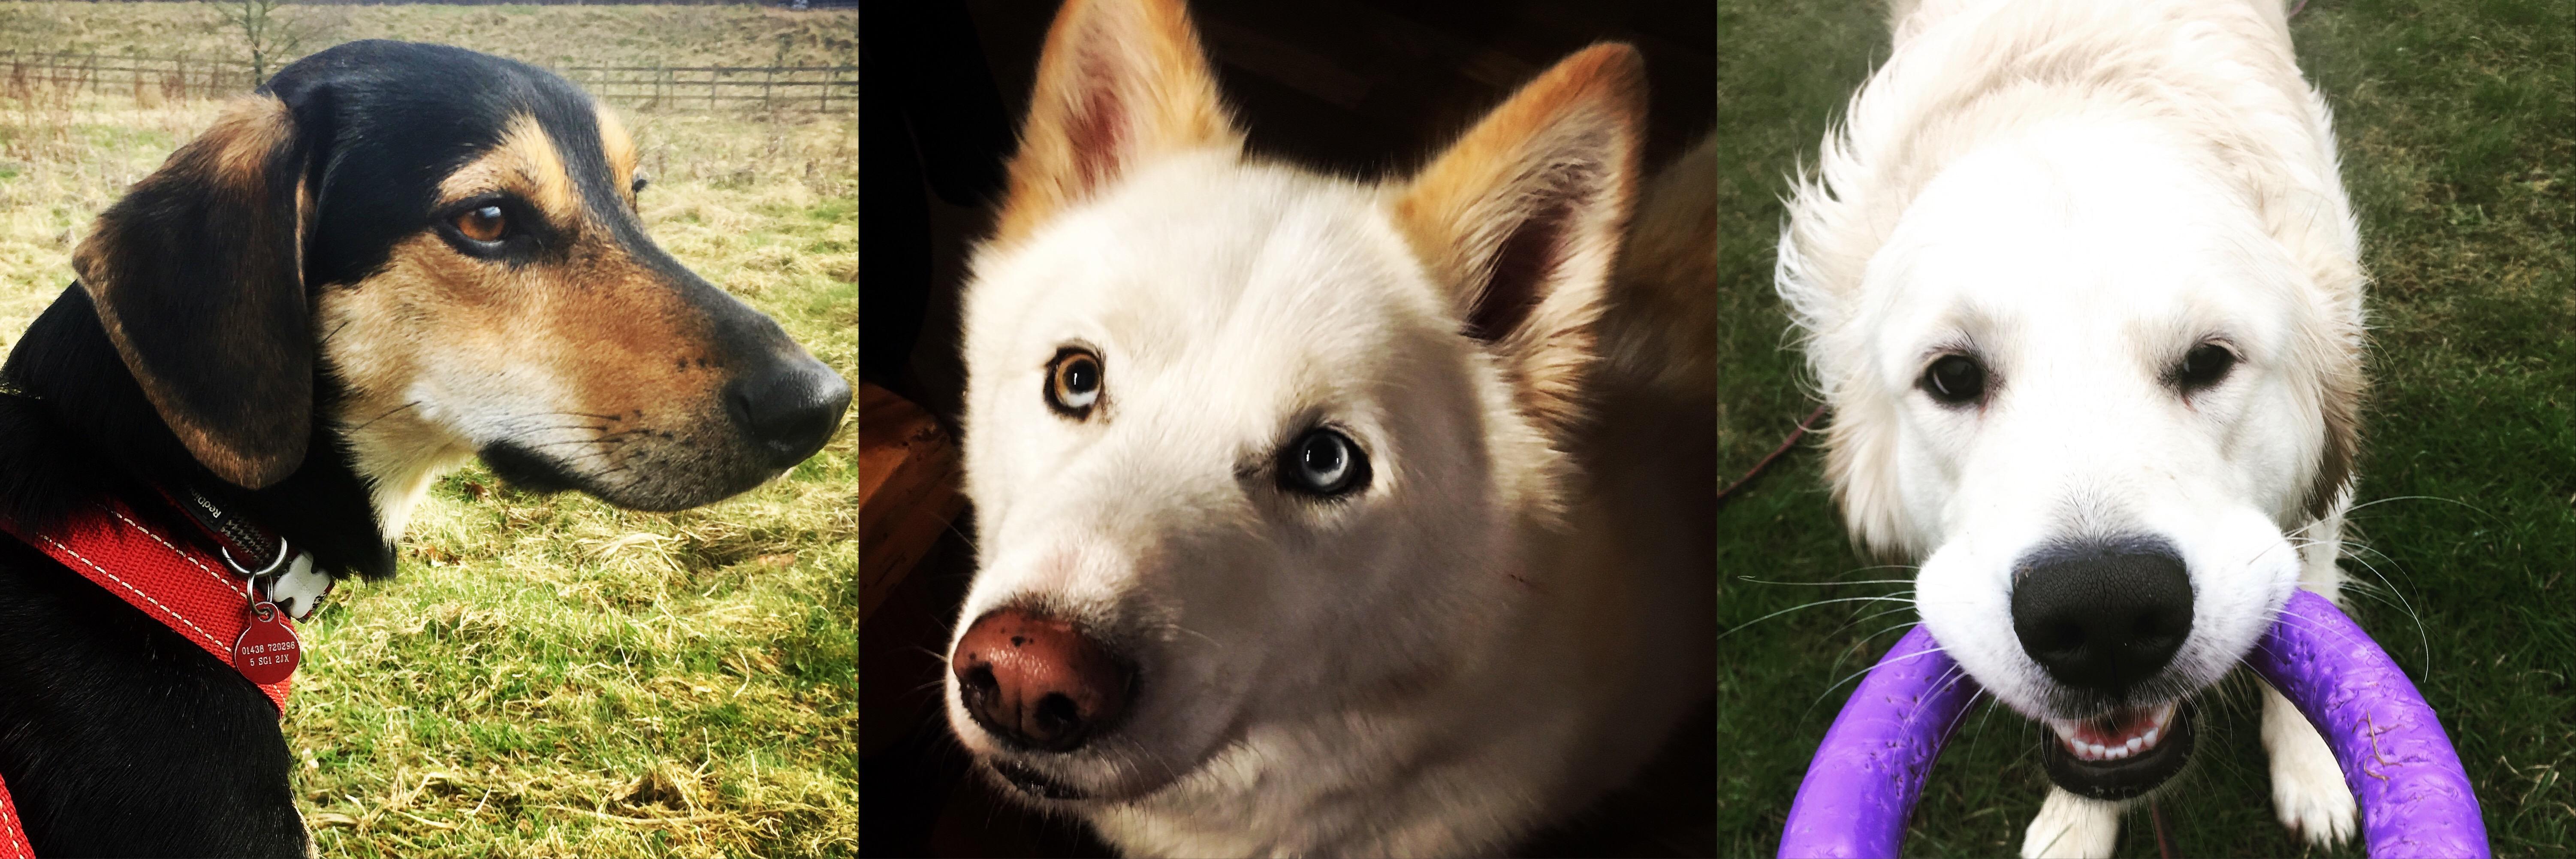 Hund og problemadferd